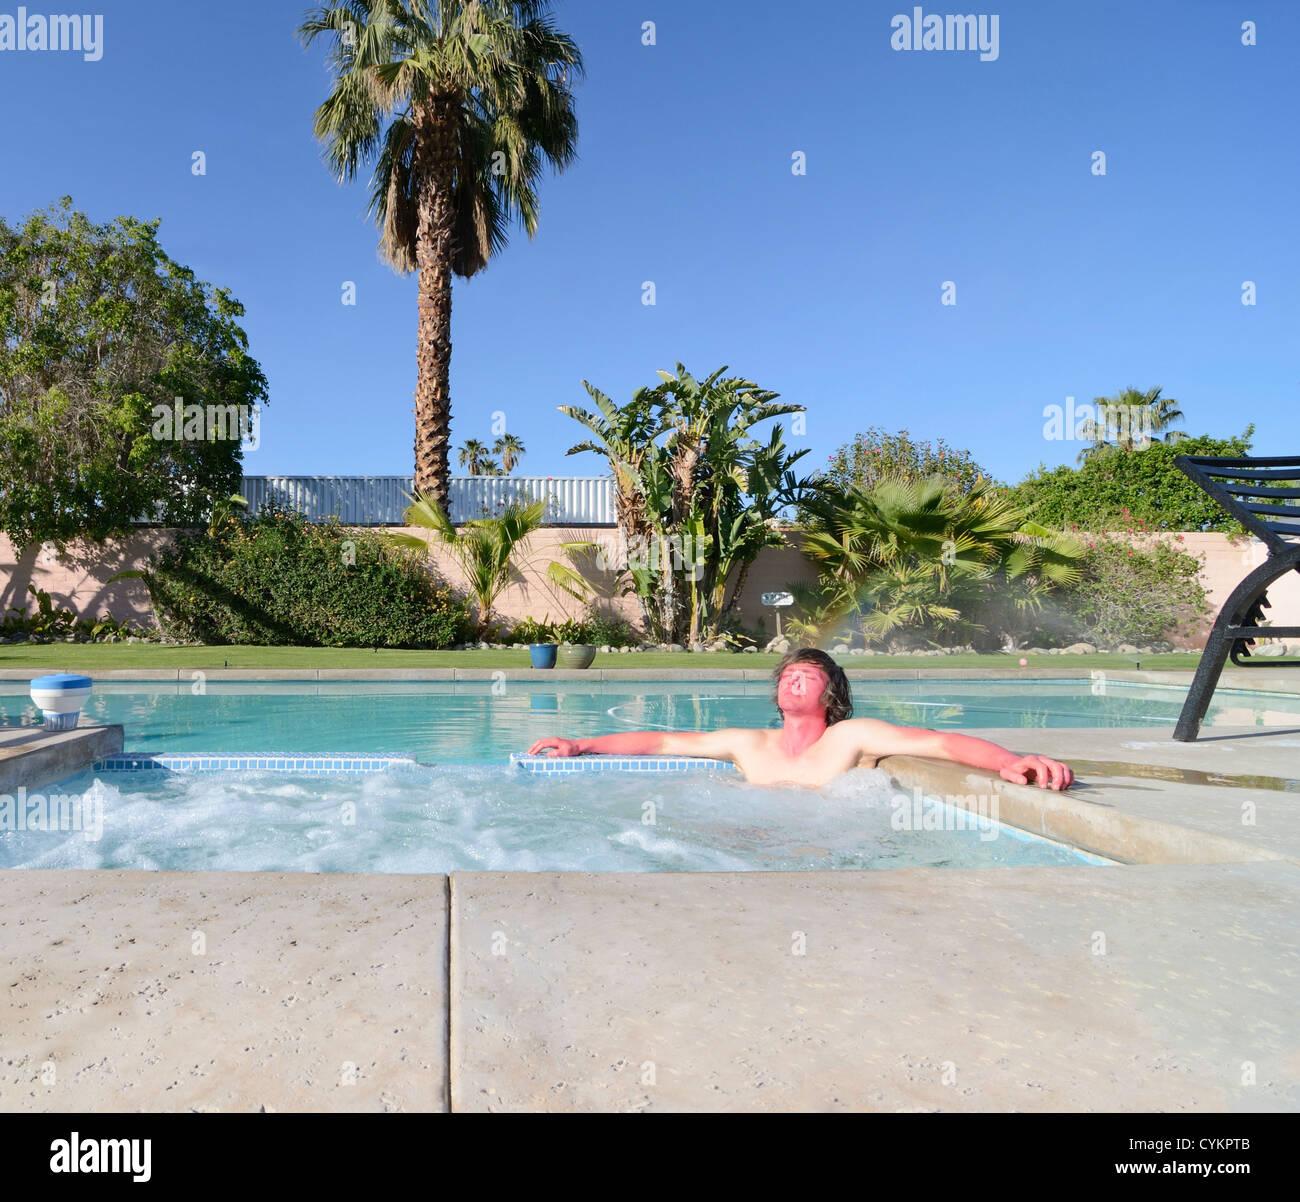 Sunburned man relaxing in hot tub - Stock Image